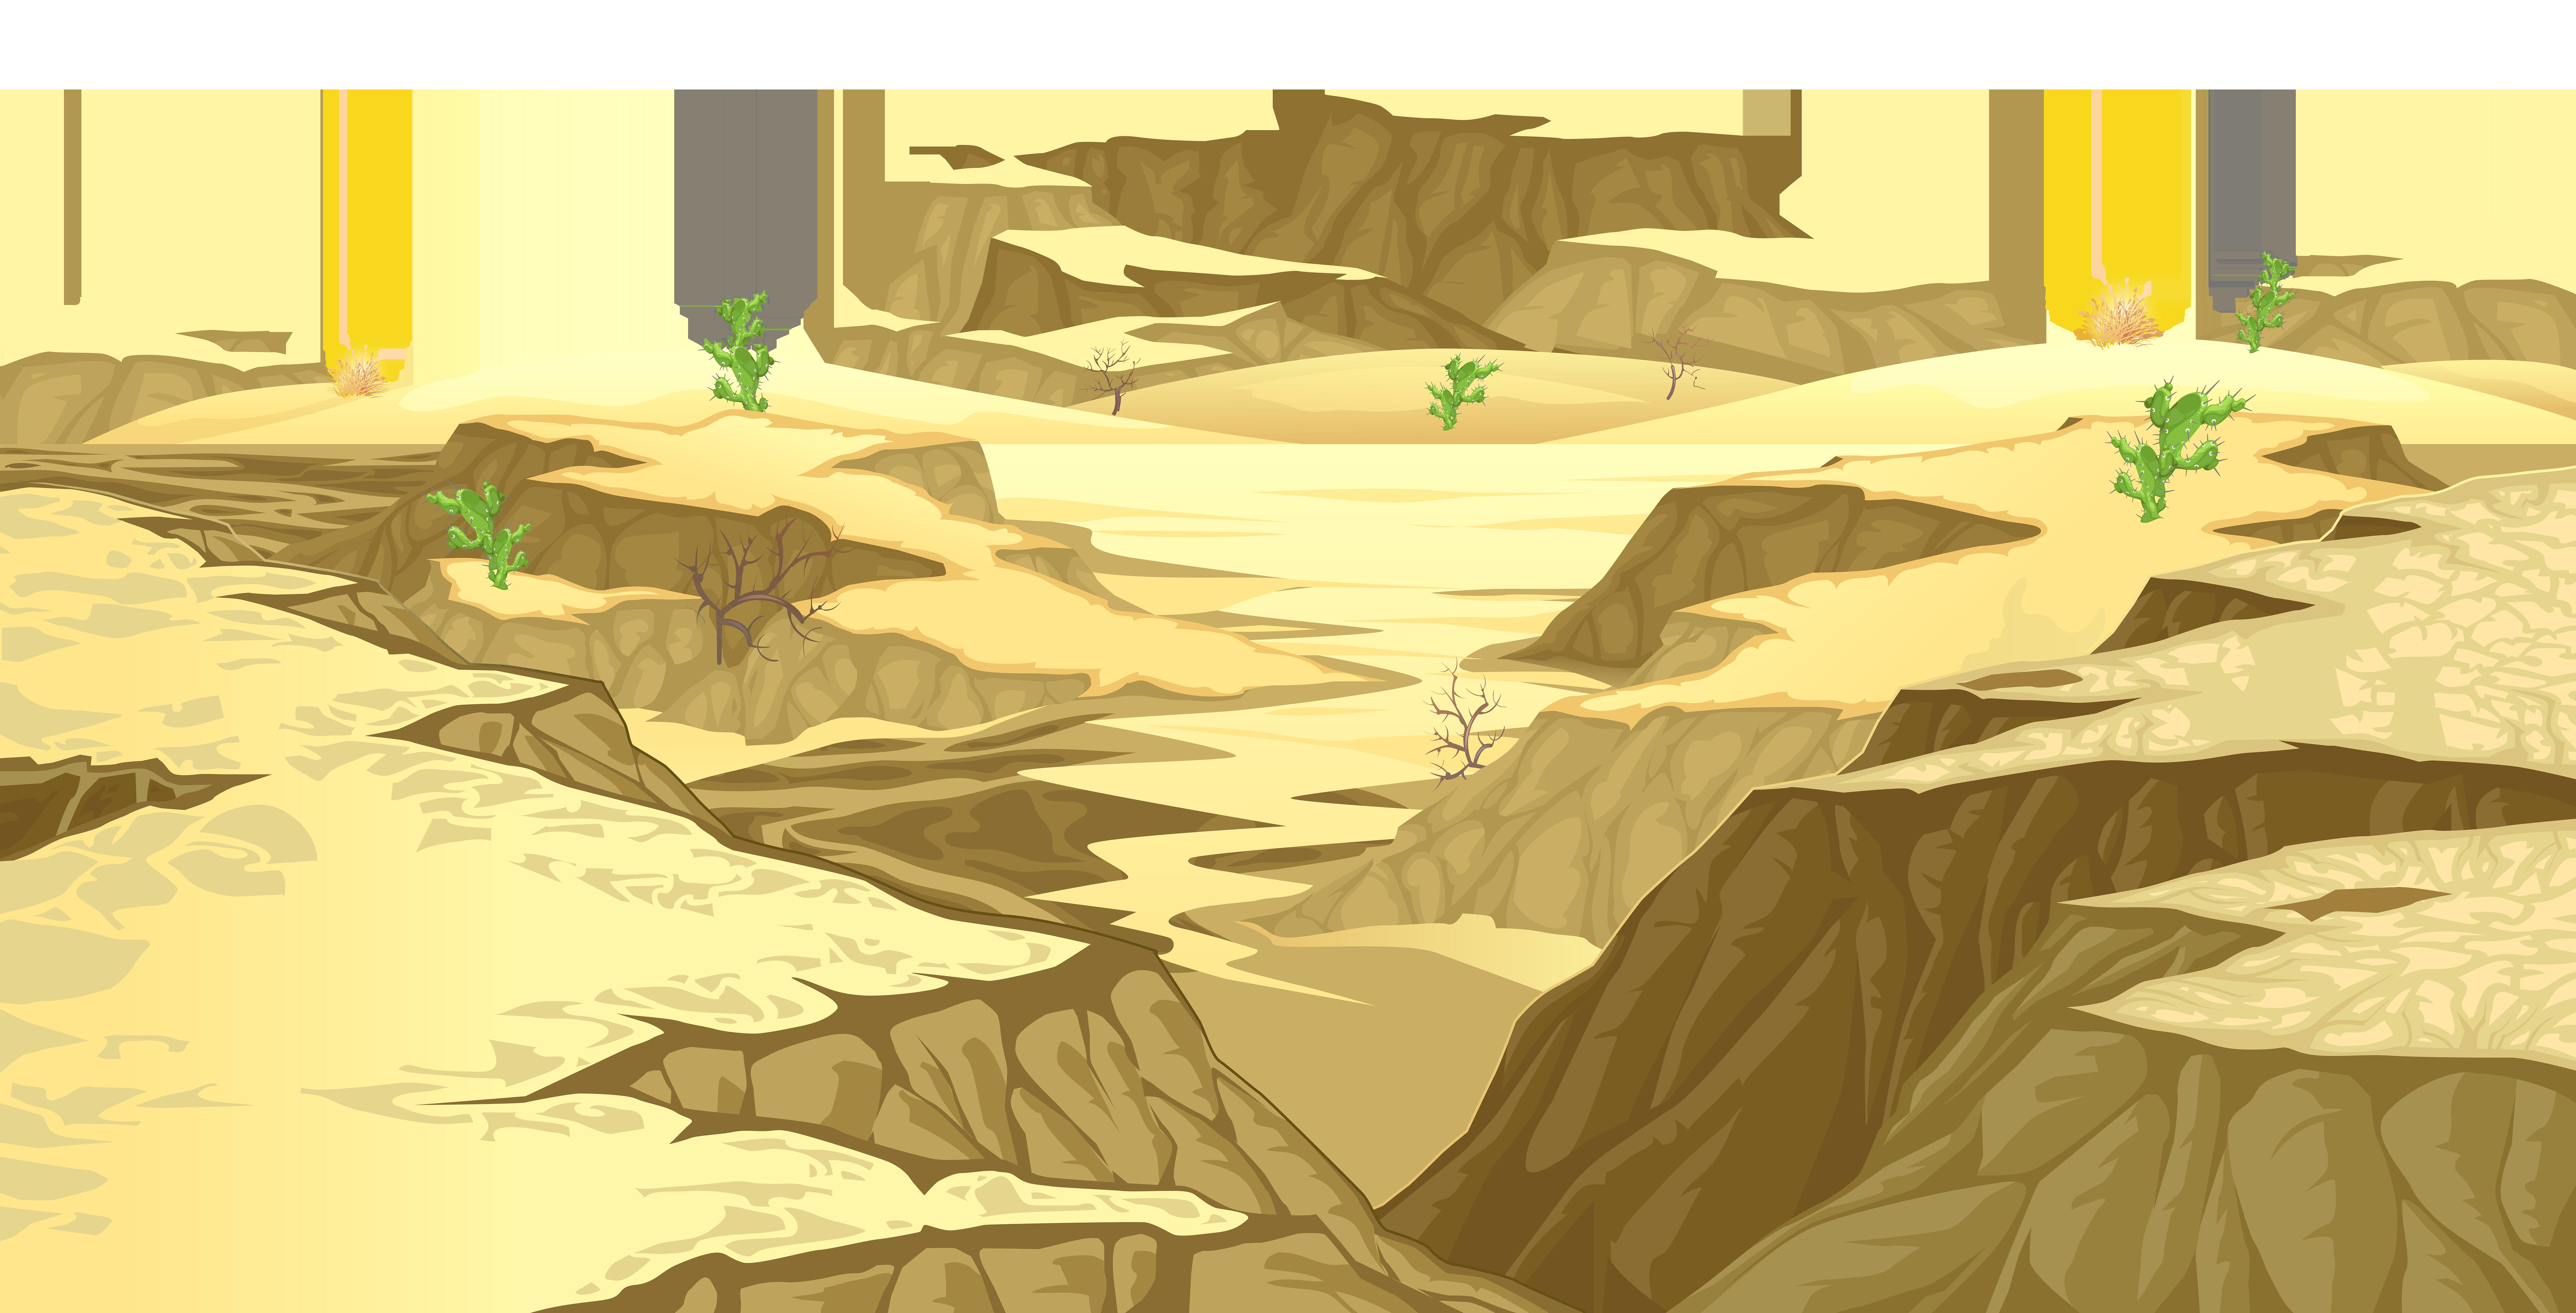 Desert Ground Cover Transparent PNG Clip Art Image.